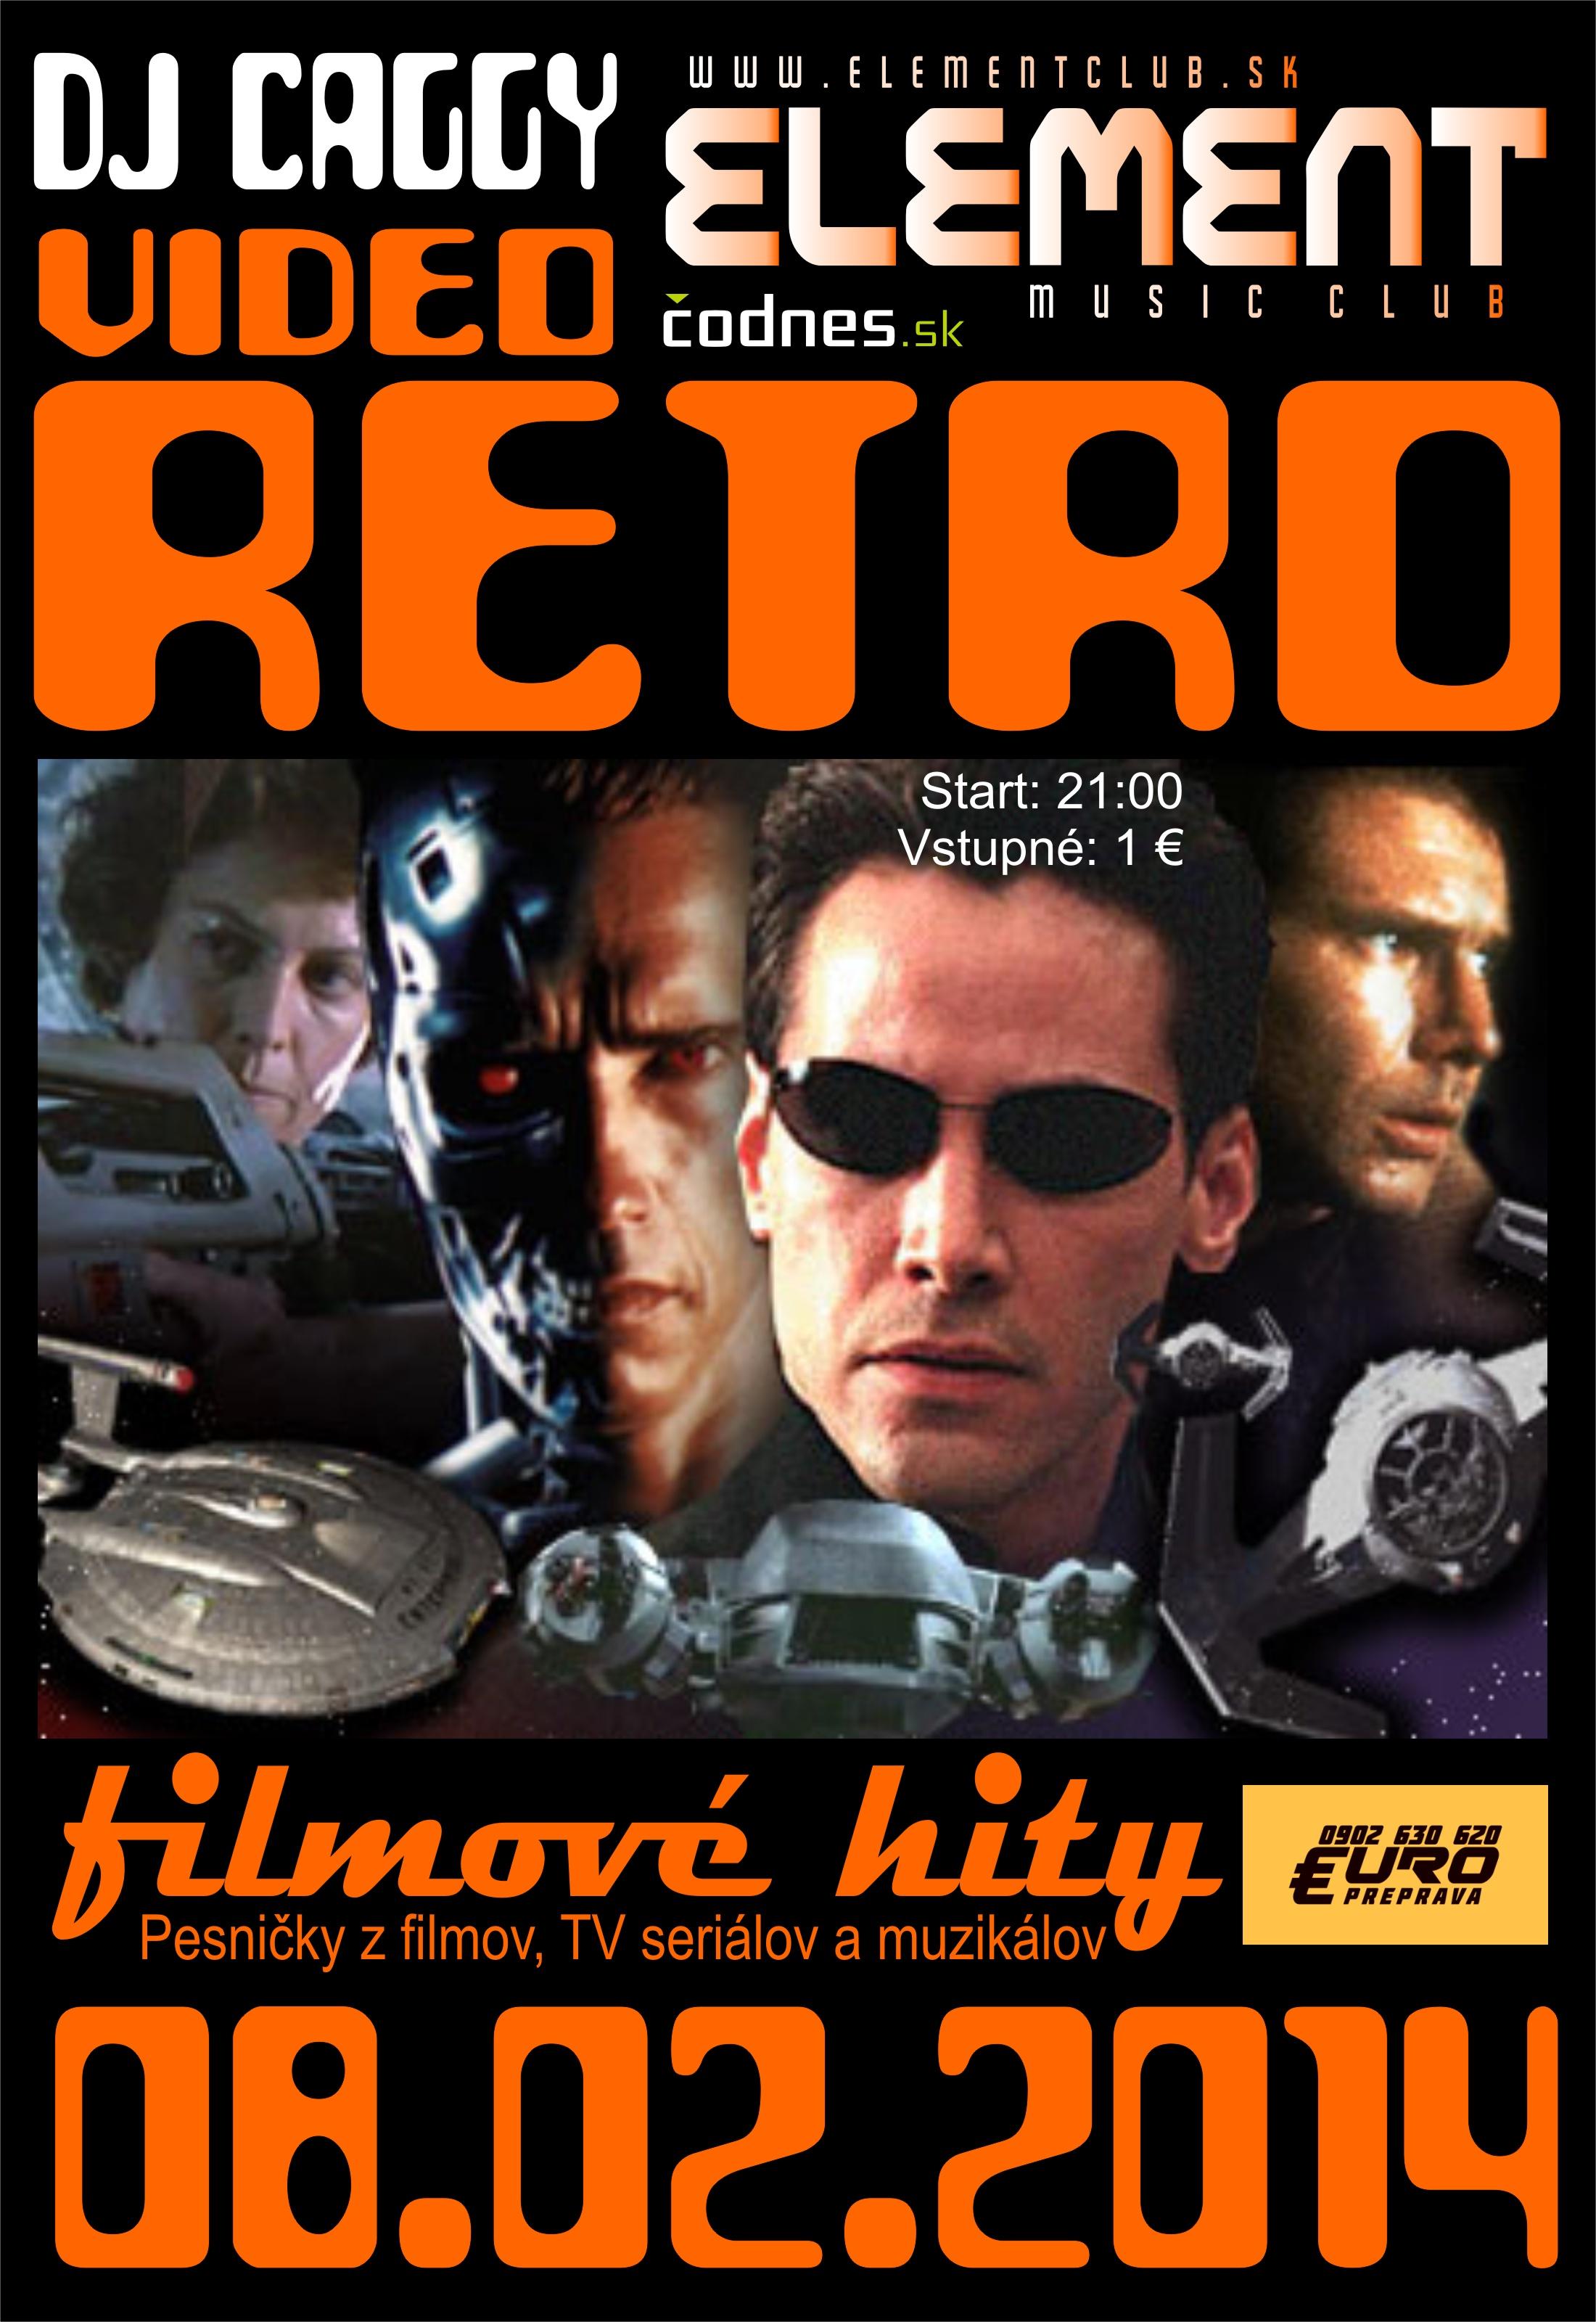 VIDEO RETRO by CAGGY (Filmové hity)